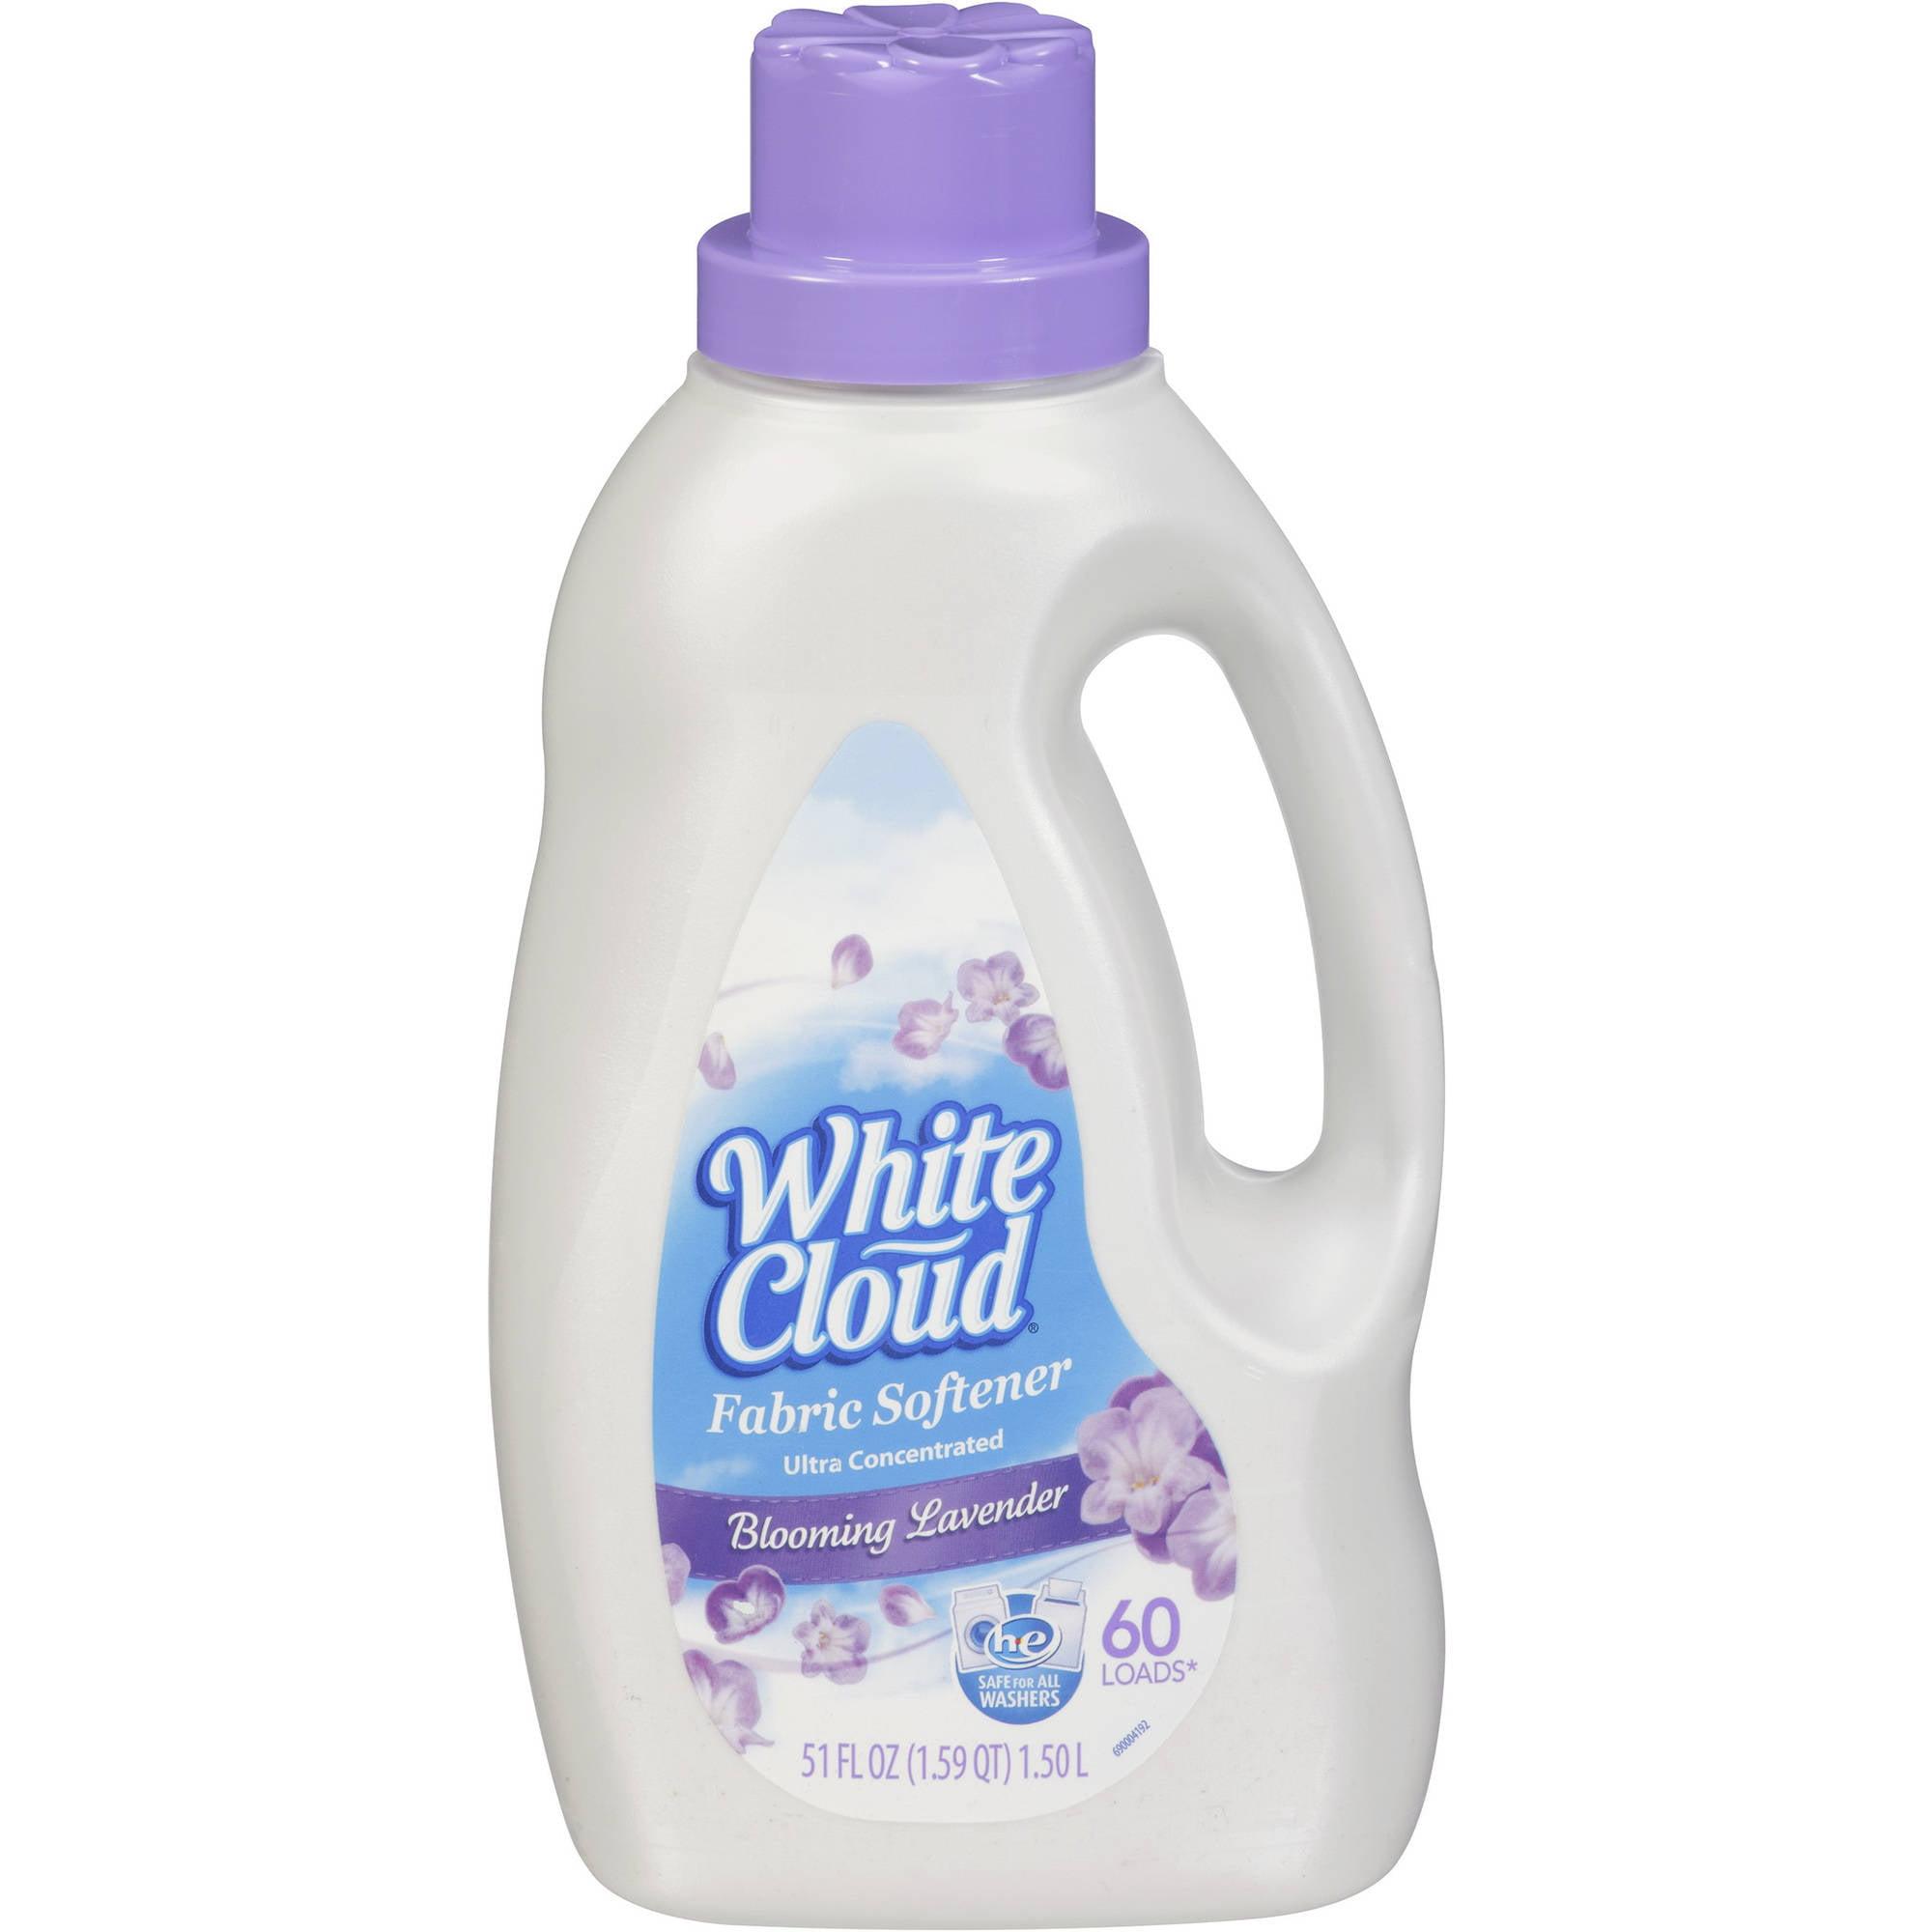 White Cloud Blooming Lavender Liquid Fabric Softener 51 fl oz